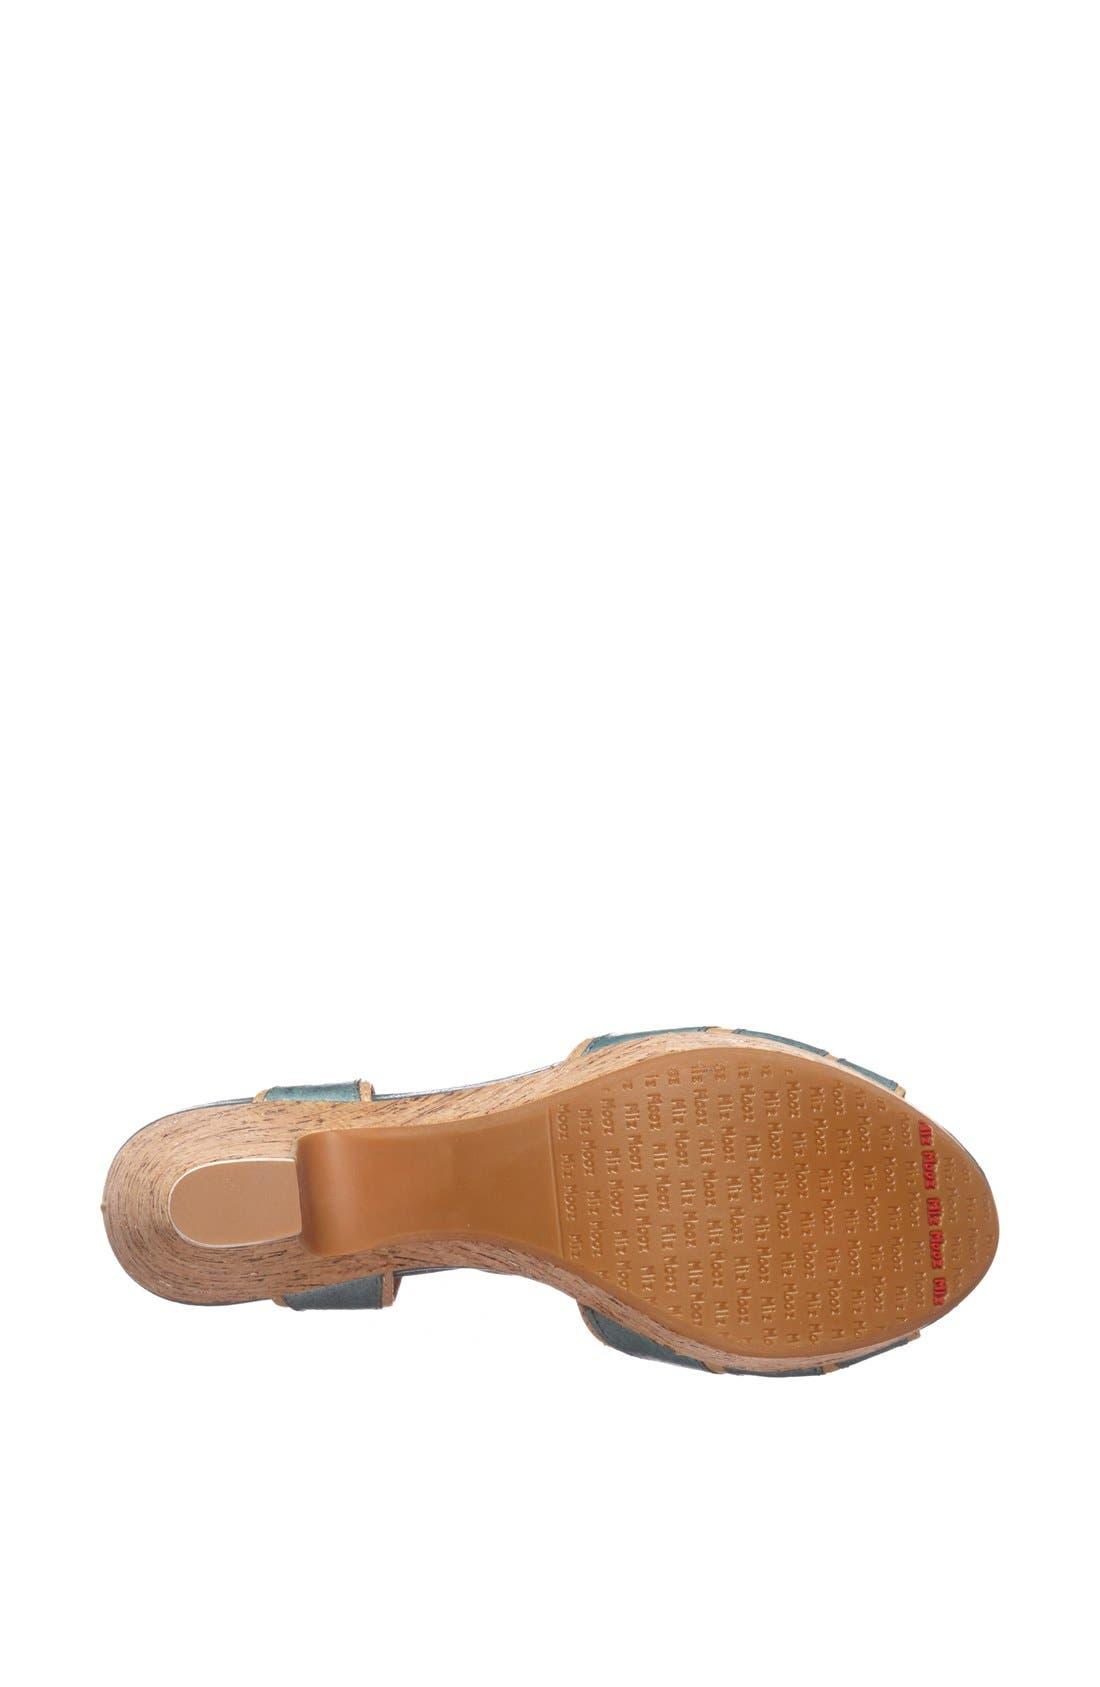 Alternate Image 4  - Miz Mooz 'Corbin' Two Tone Sandal